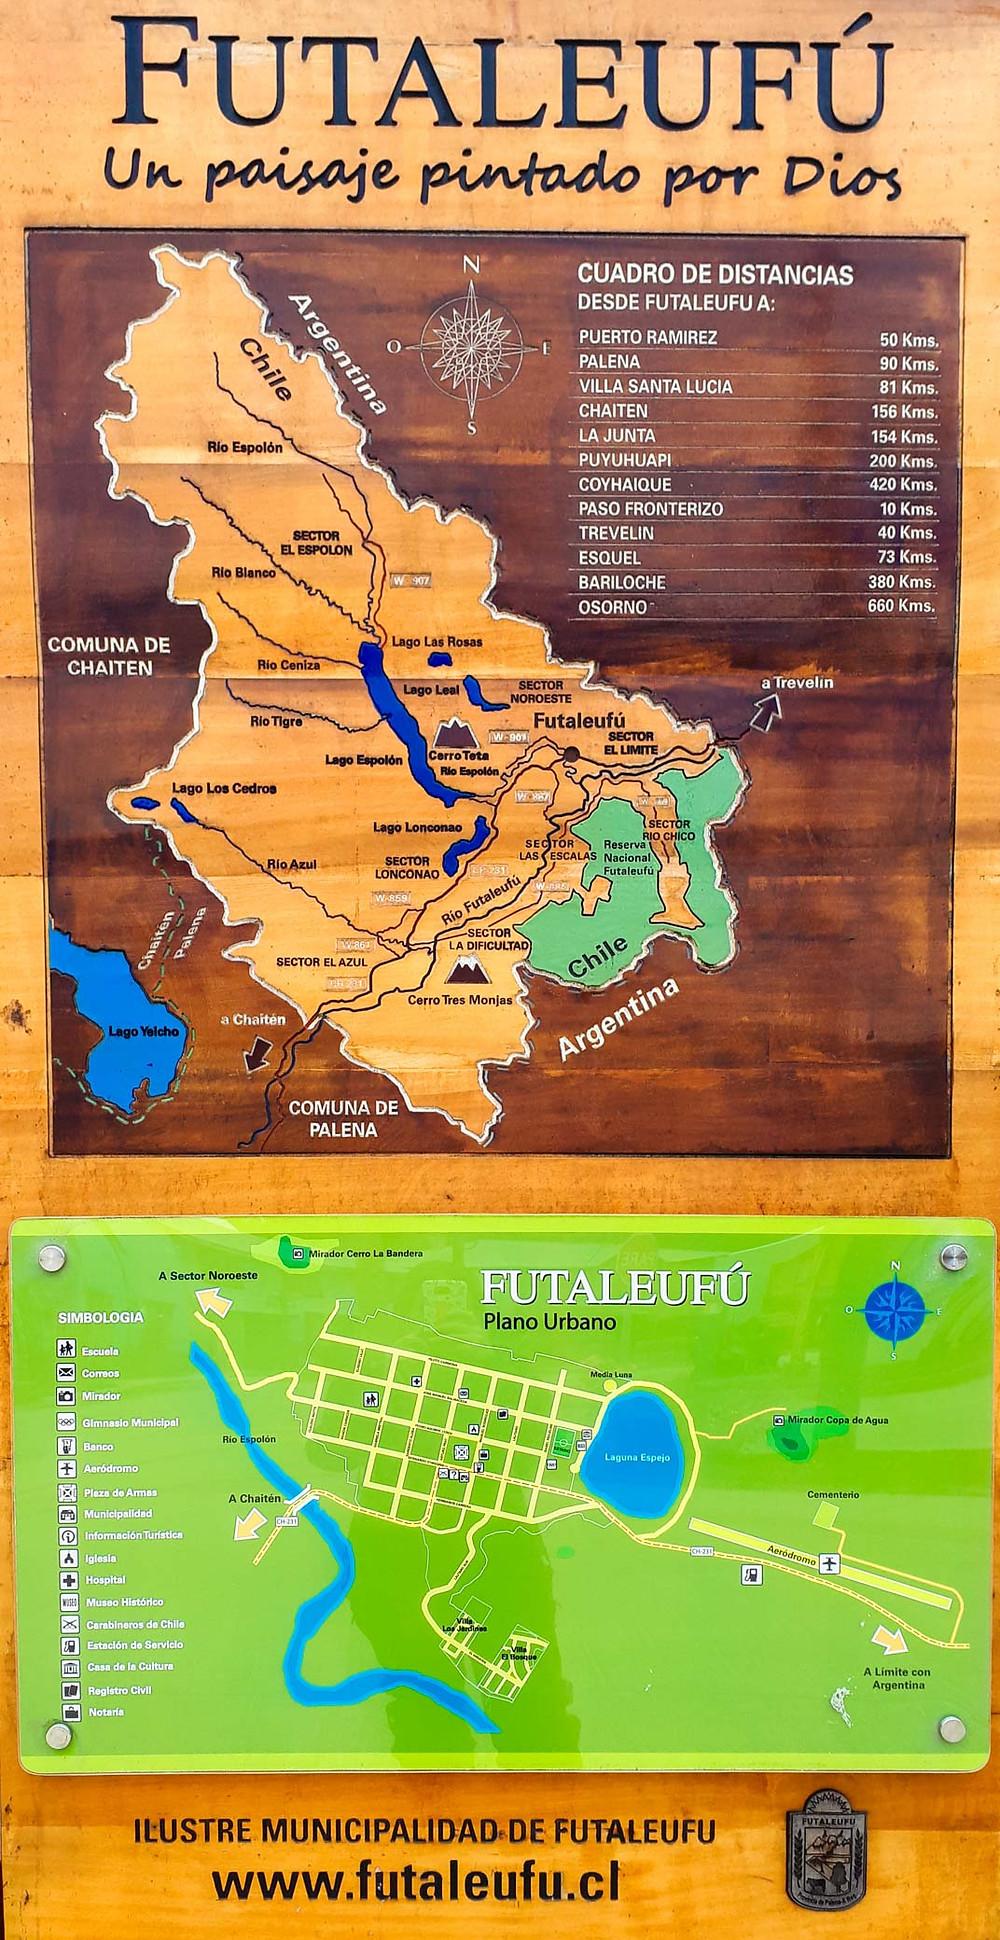 Map sign of Futalefufú and surrounding areas - AvVida.co.uk